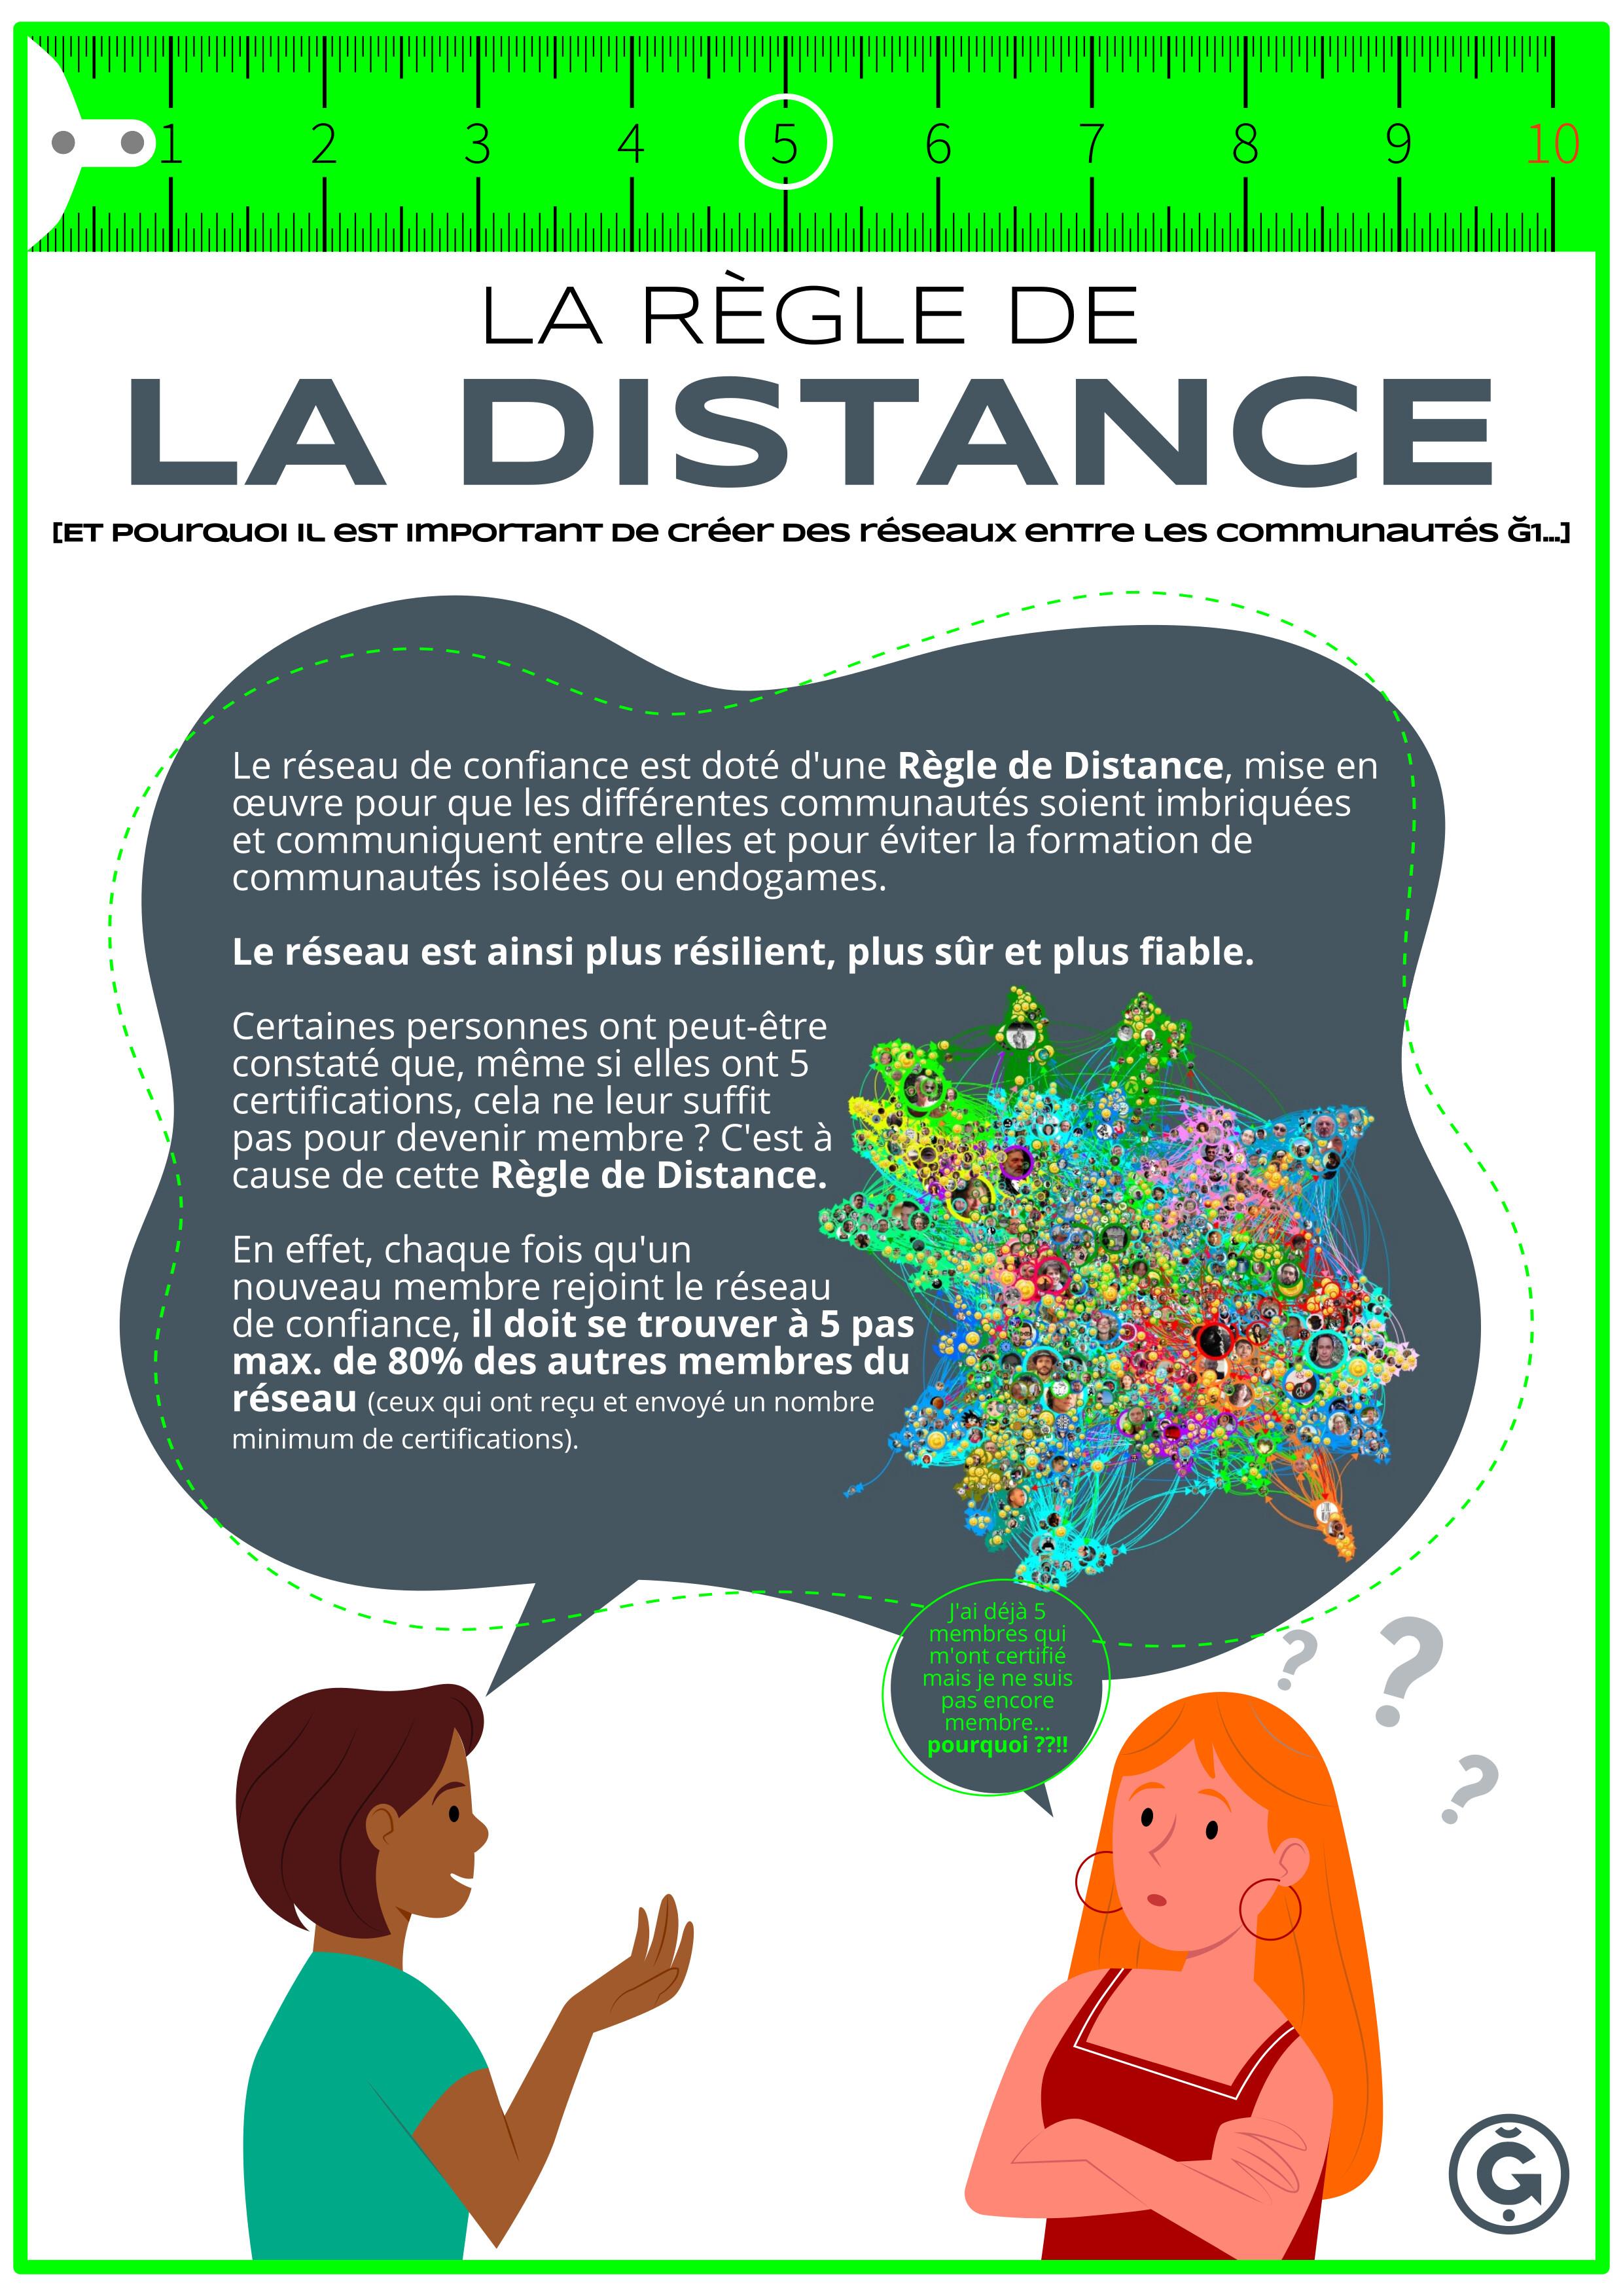 Regla_Distancia_FR